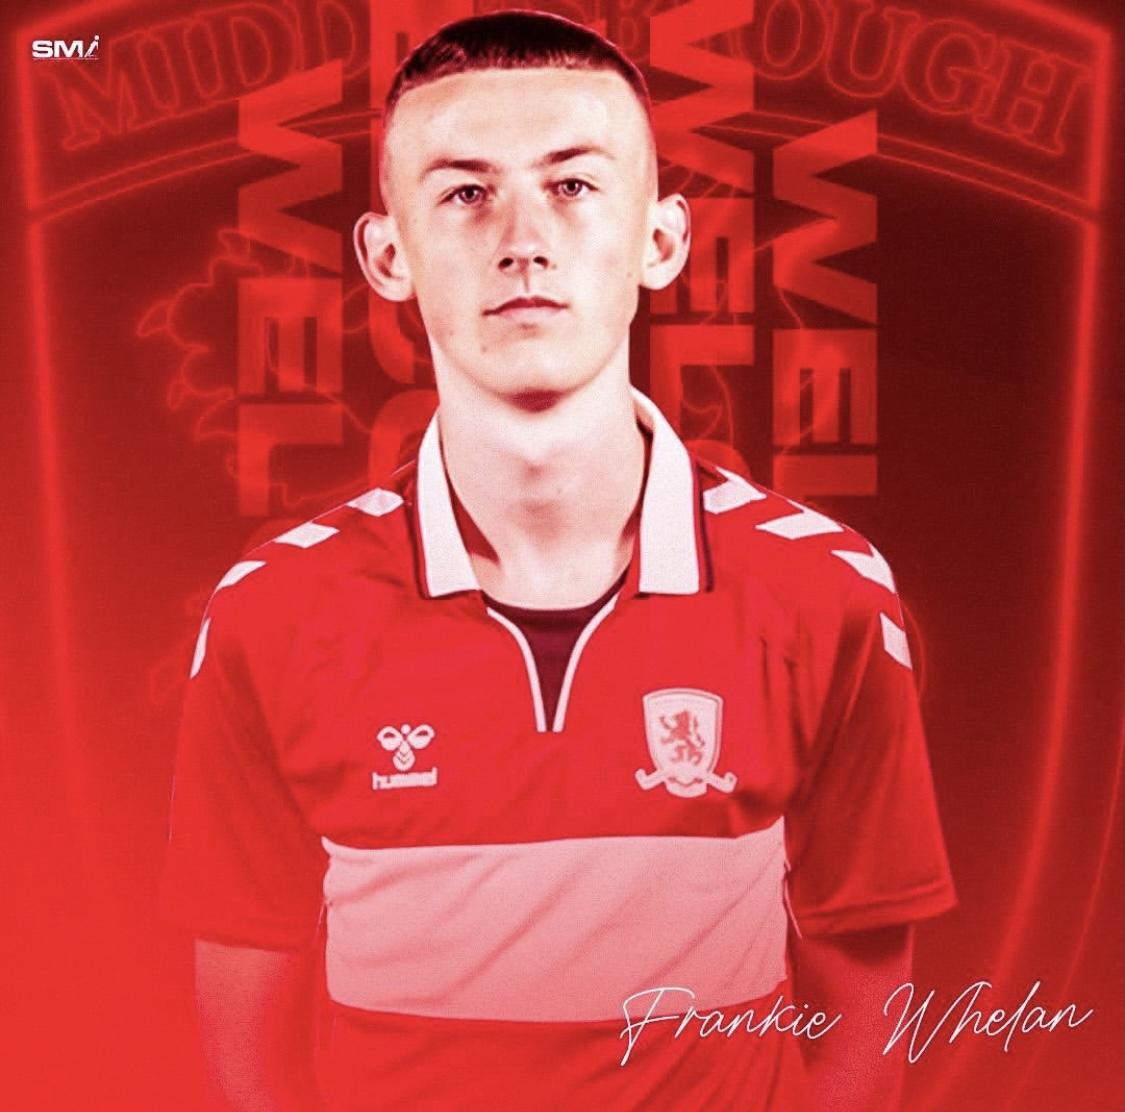 New recruit Frankie Whelan